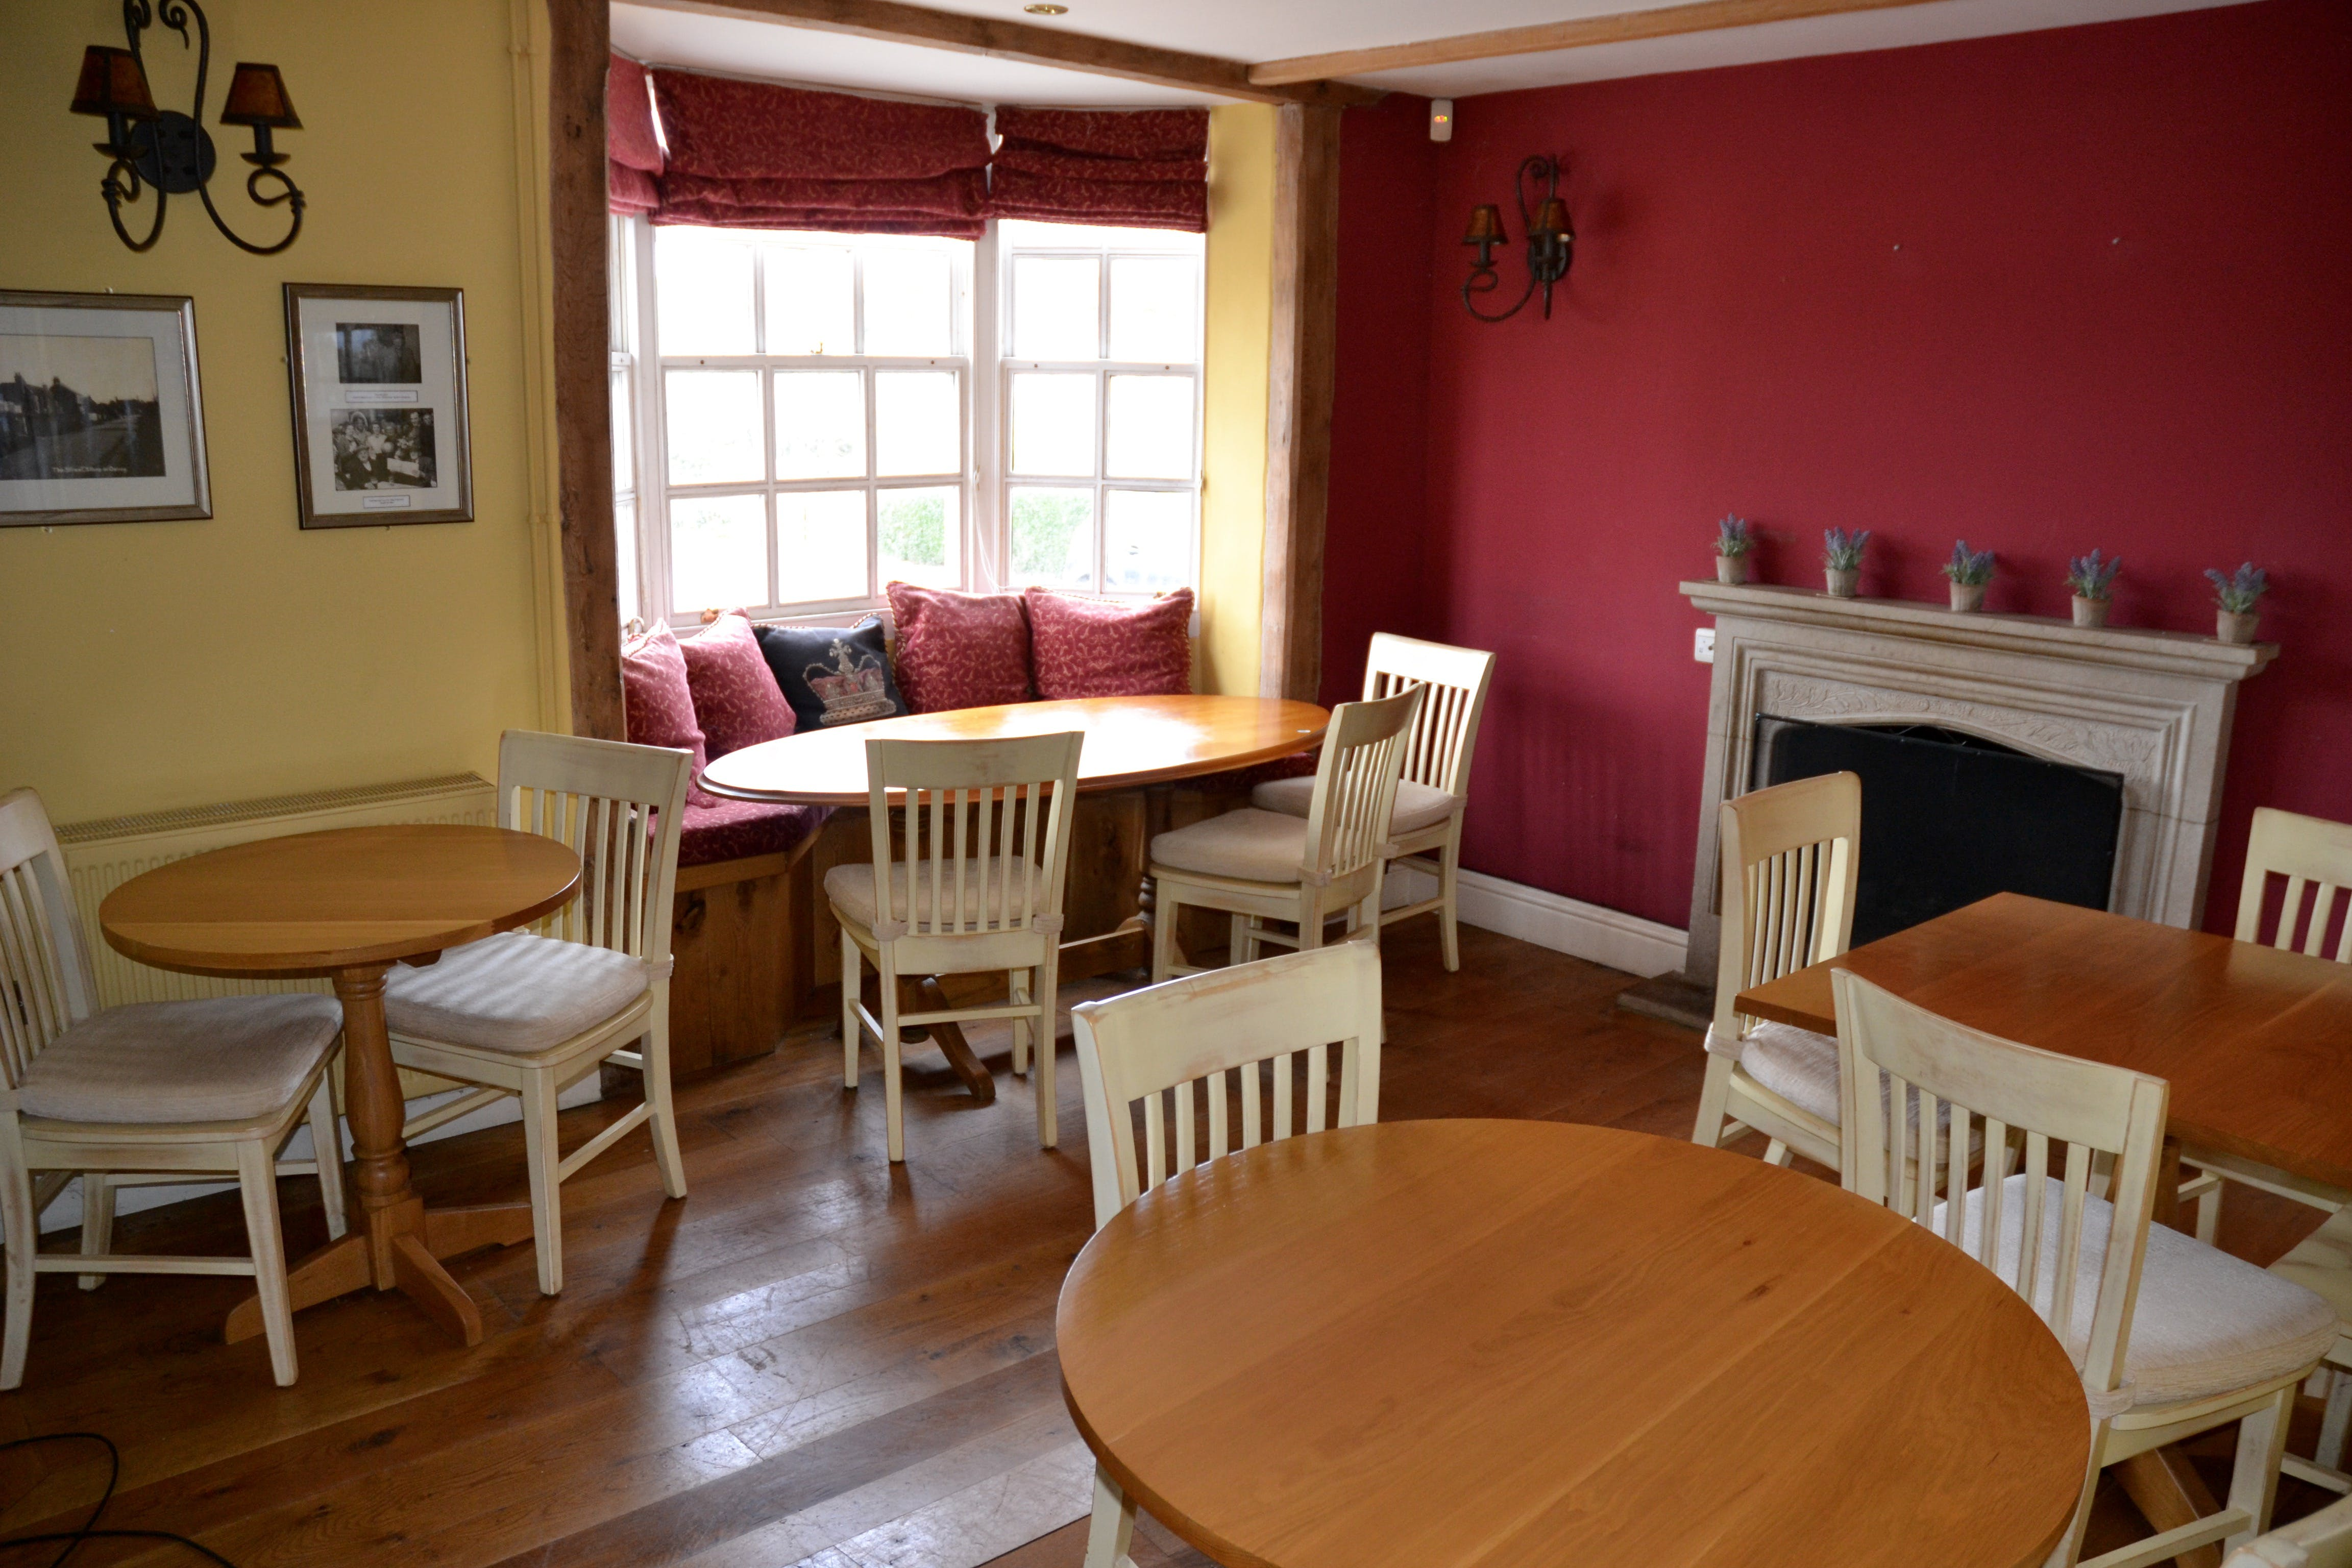 The Crown Inn, Tenterden, Leisure / Retail For Sale - DSC_0028.jpg